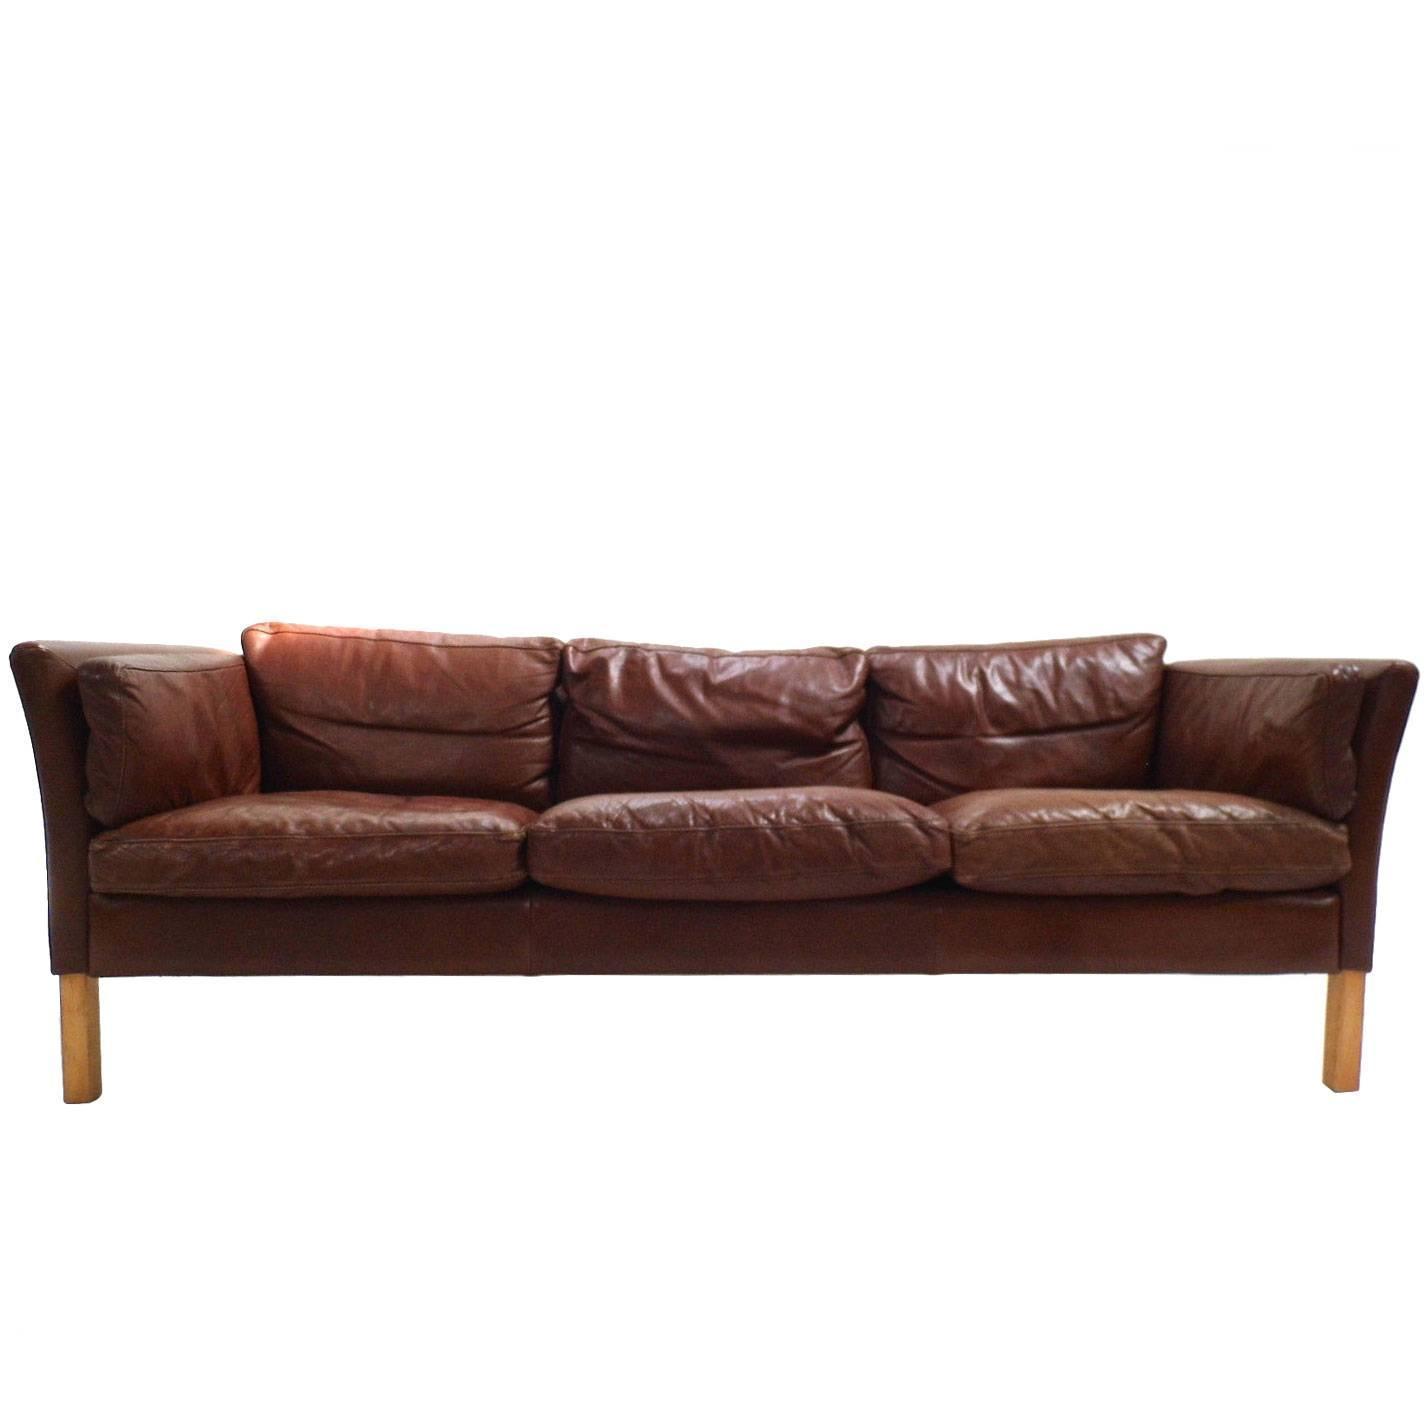 Sofá Clapton: Danish Chestnut Brown Leather Three-Seat Sofa, Midcentury